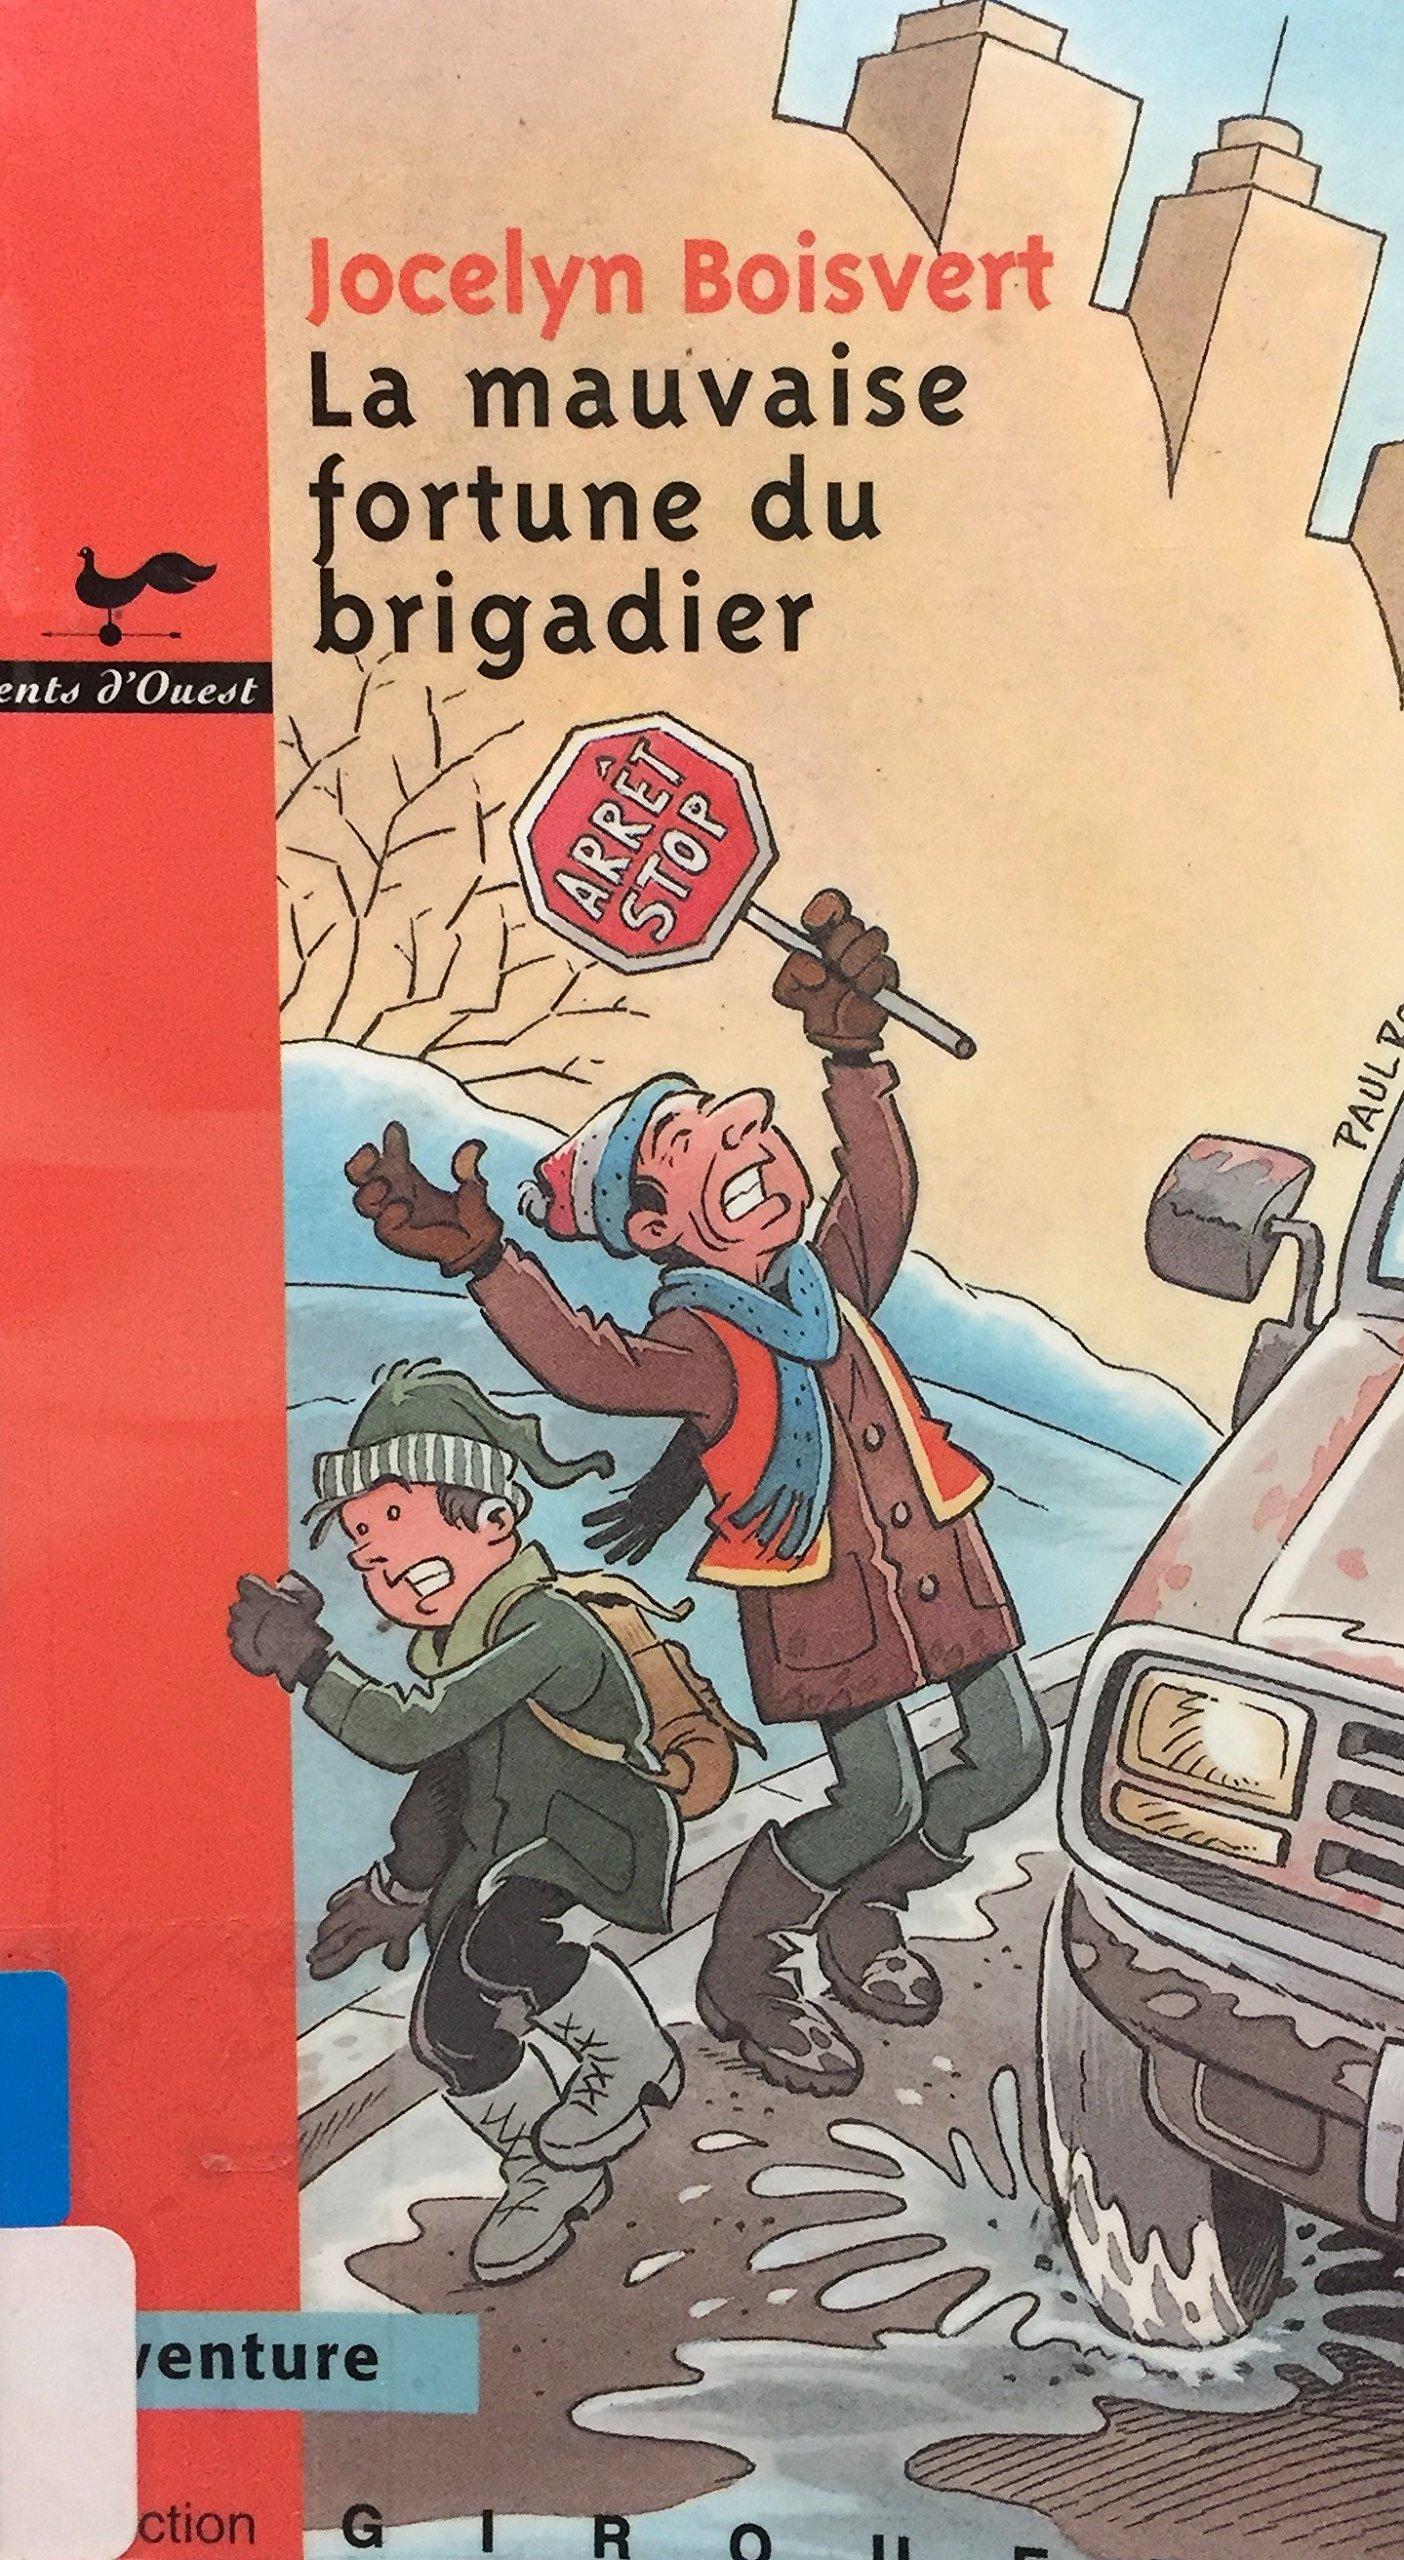 La mauvaise fortune du brigadier